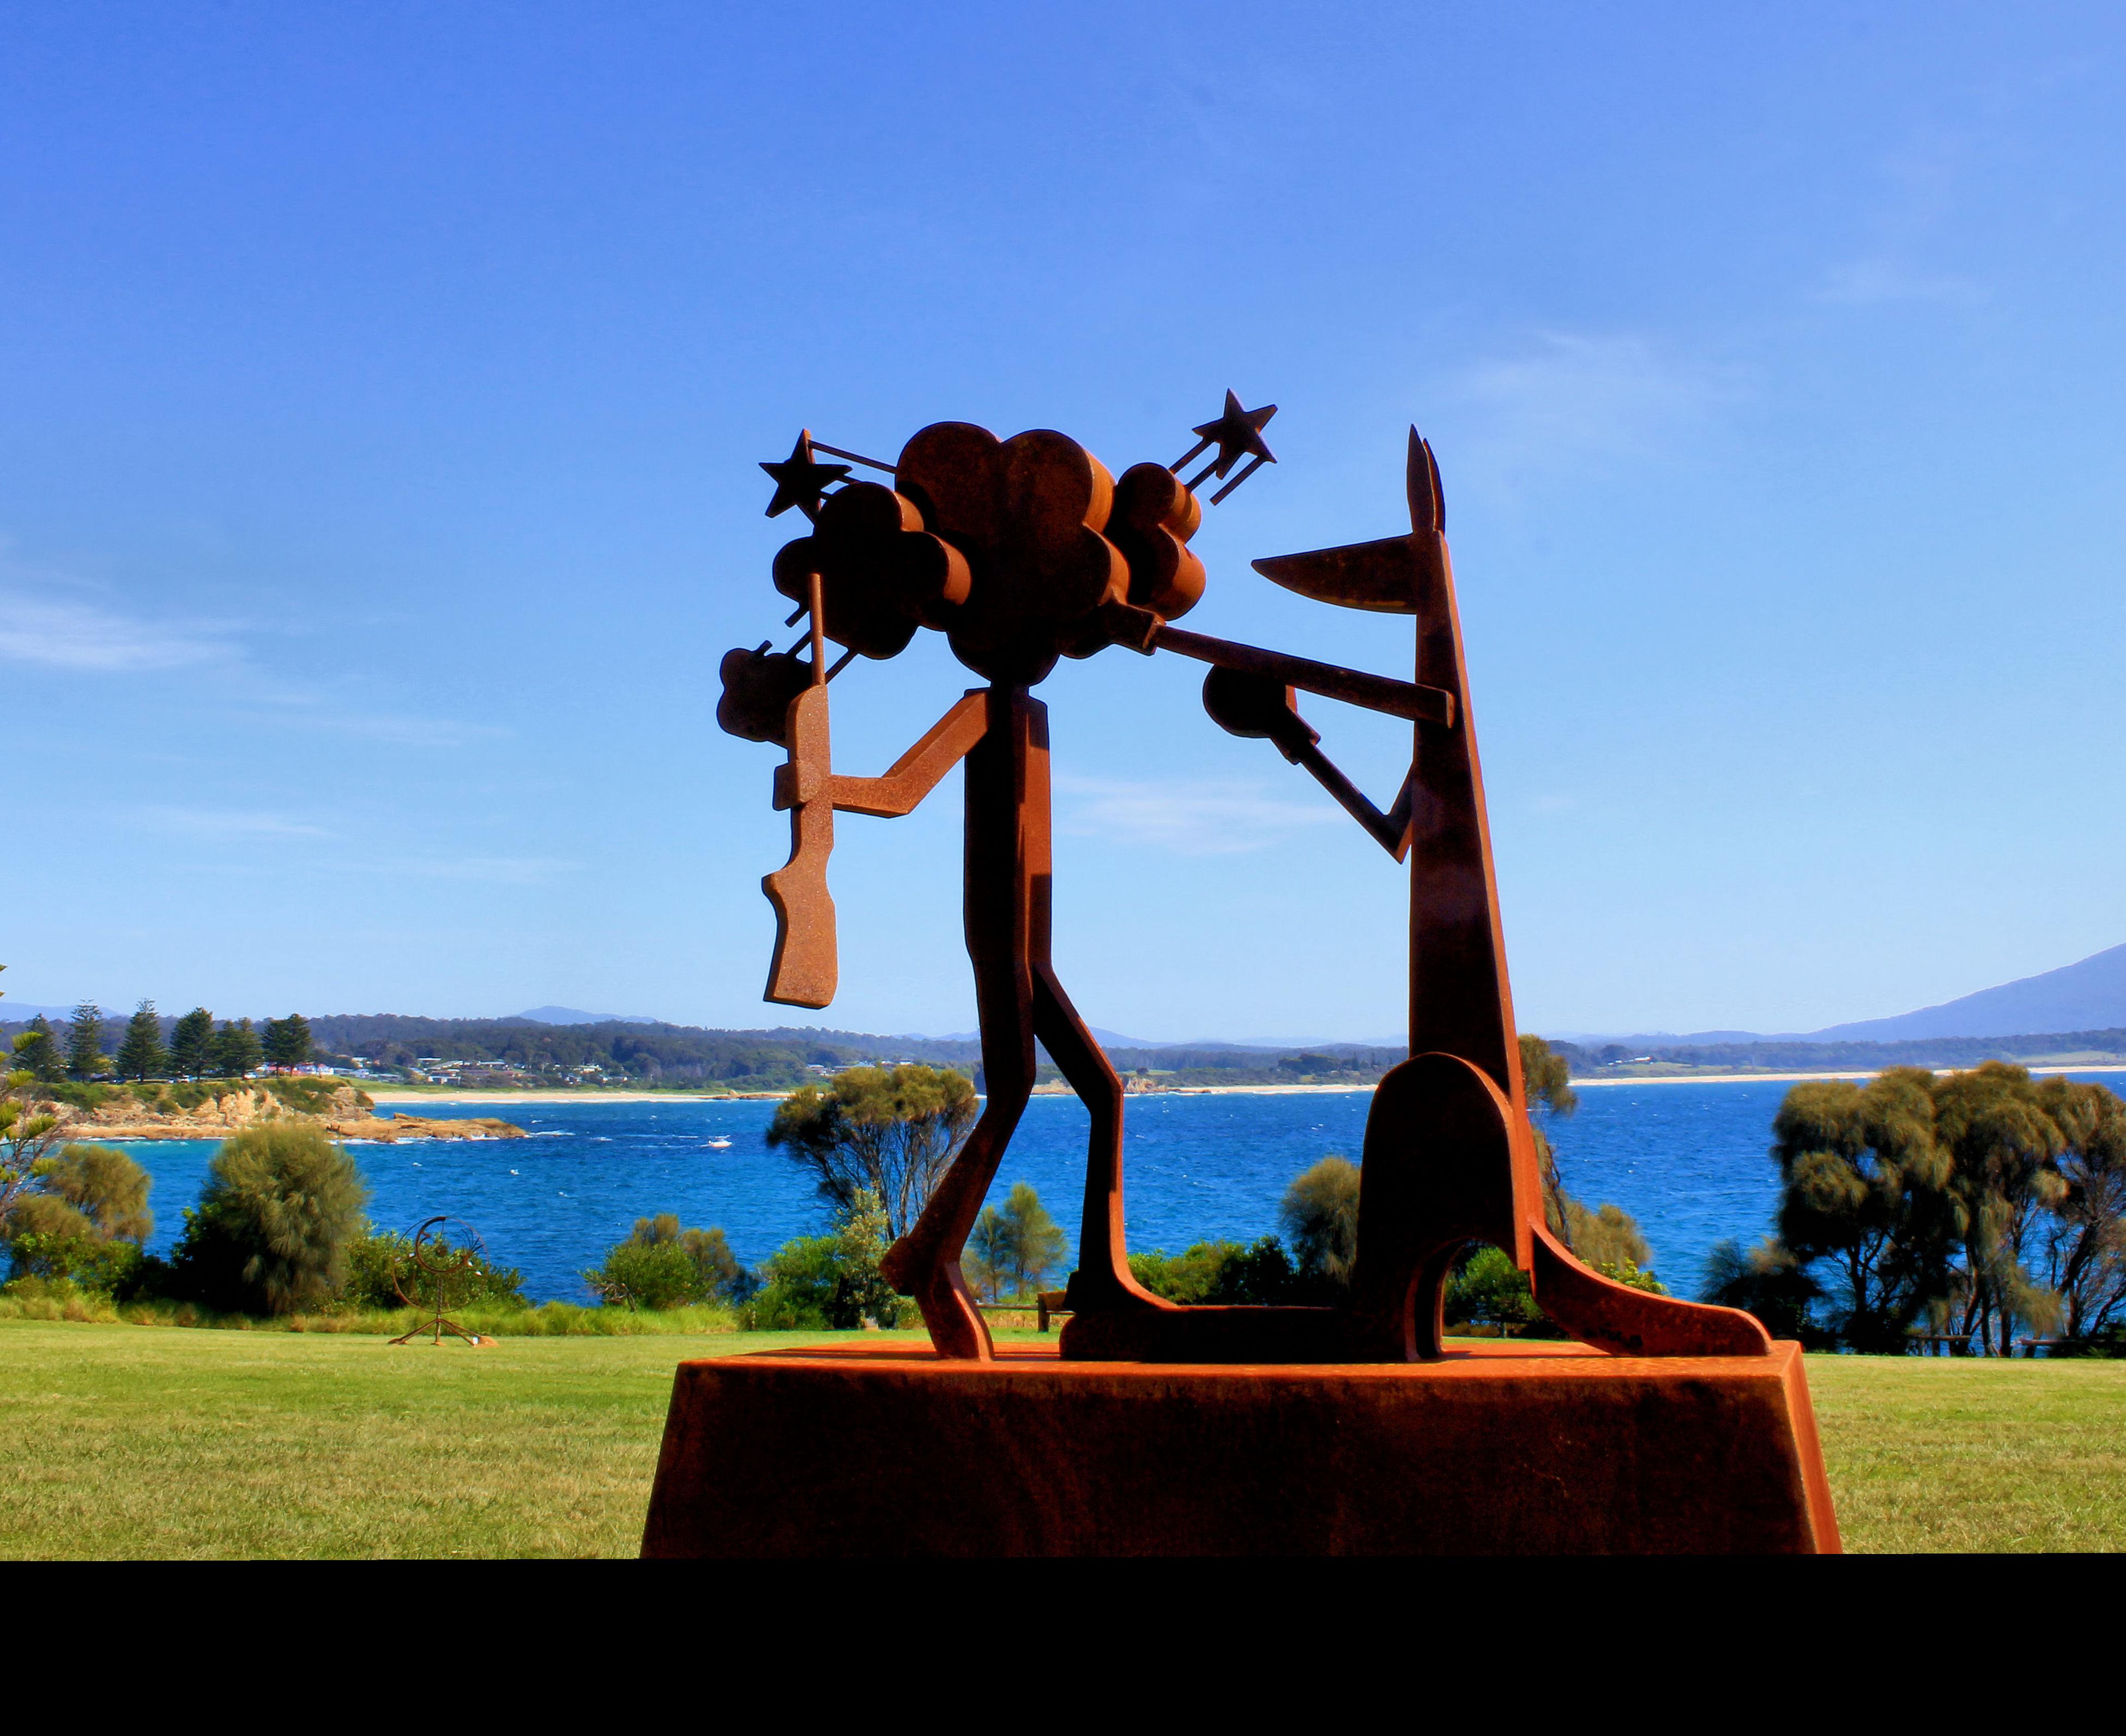 The boxing Kangaroo getting his revenge on the hunter lol Australia Blue Boxing Kangaroo By The Sea Hunter Kangaroo Metal Sculpture Outdoors Sculptures Sea Sky Sculptures By The Sea